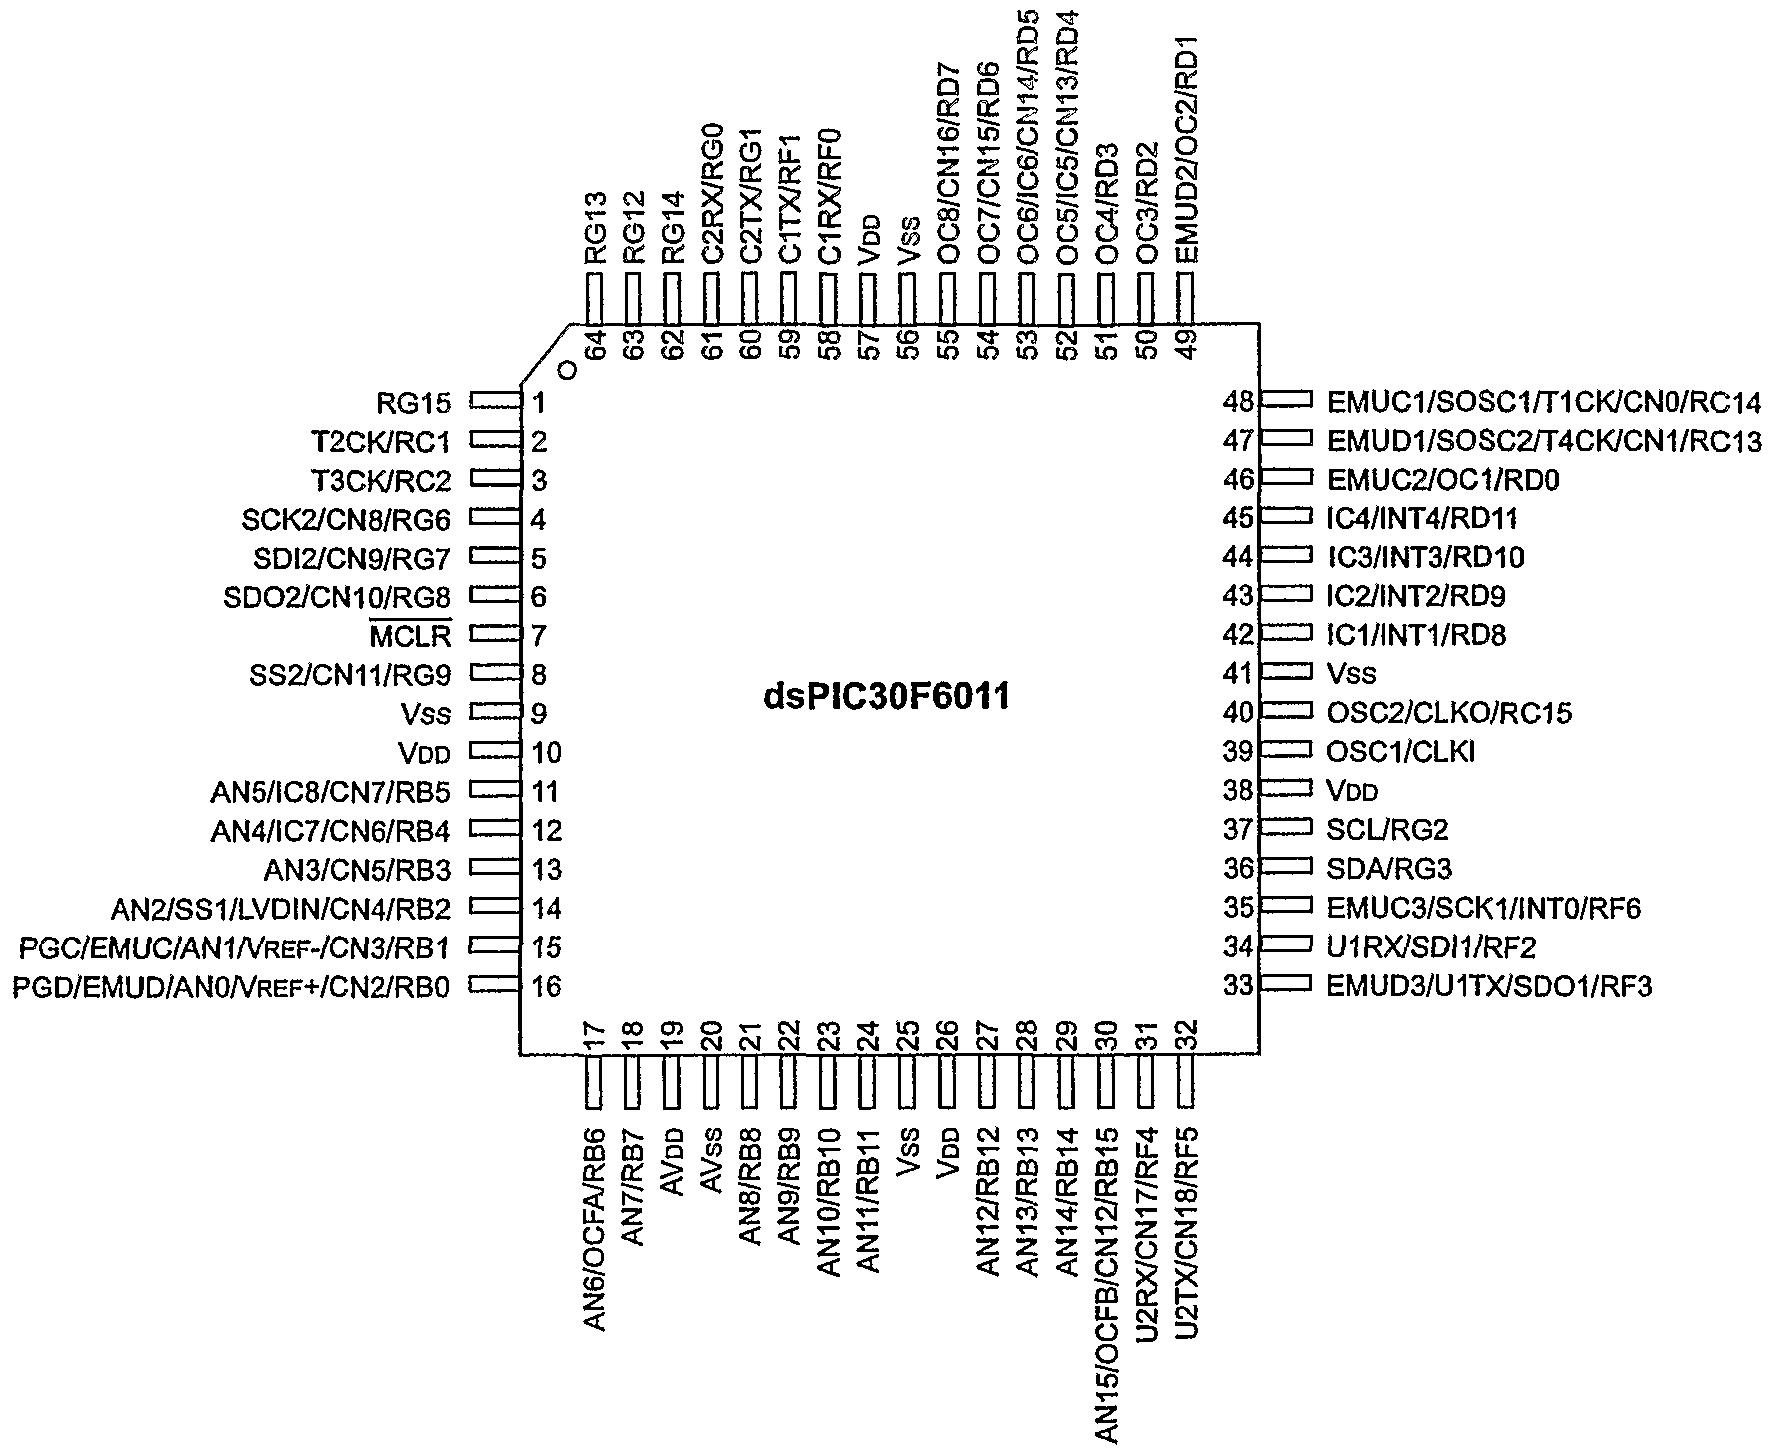 Rg14 To Rg9 Wiring Diagram